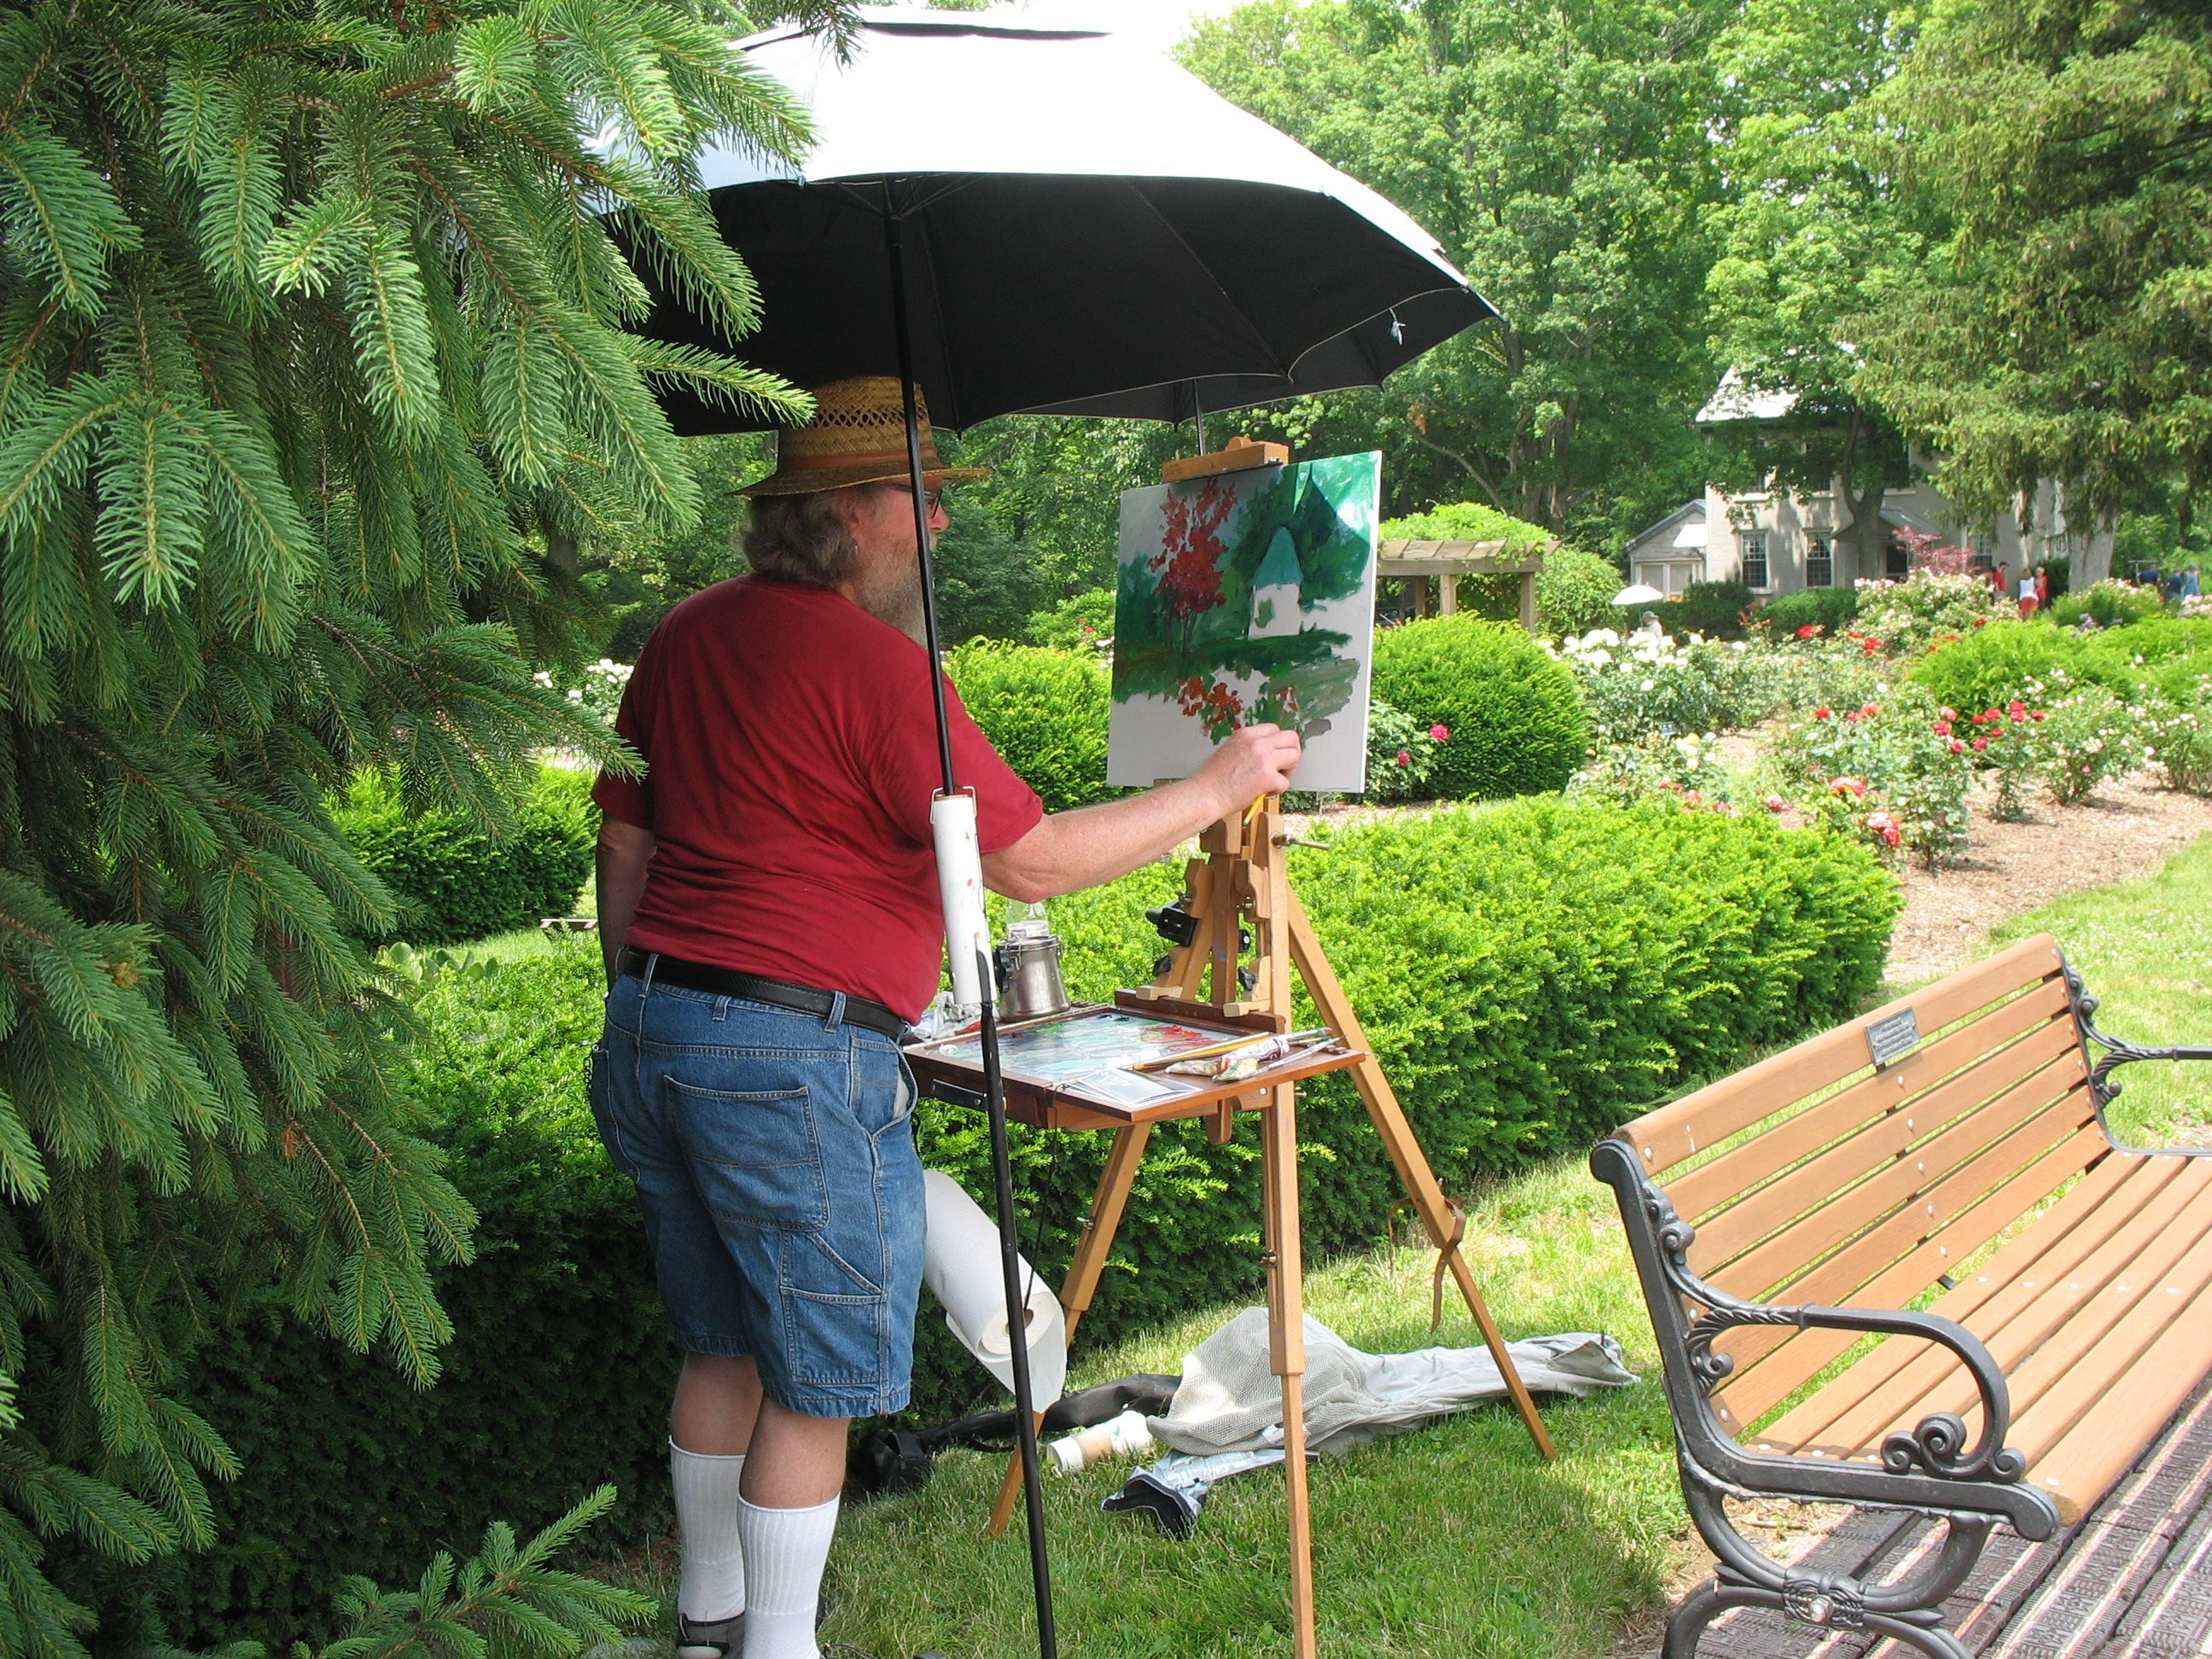 June 23,2014 Secret Garden tour Richmond Indiana Garden